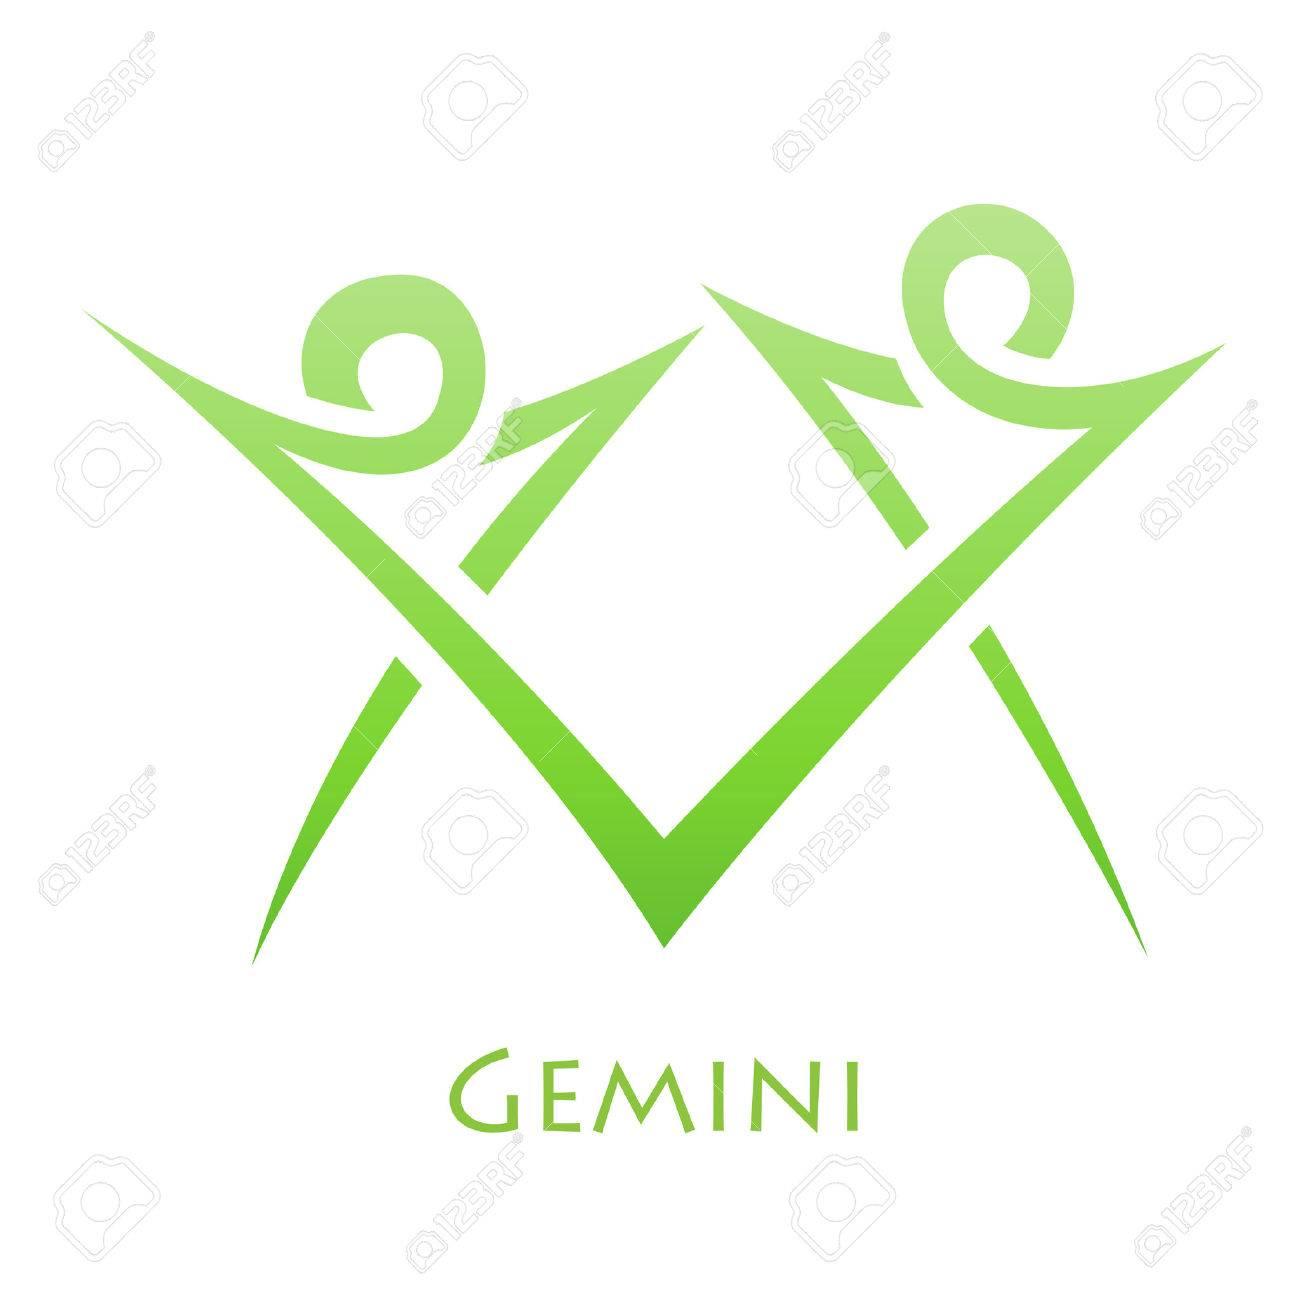 Illustration of simplistic lines gemini zodiac star sign isolated illustration of simplistic lines gemini zodiac star sign isolated on a white background stock vector buycottarizona